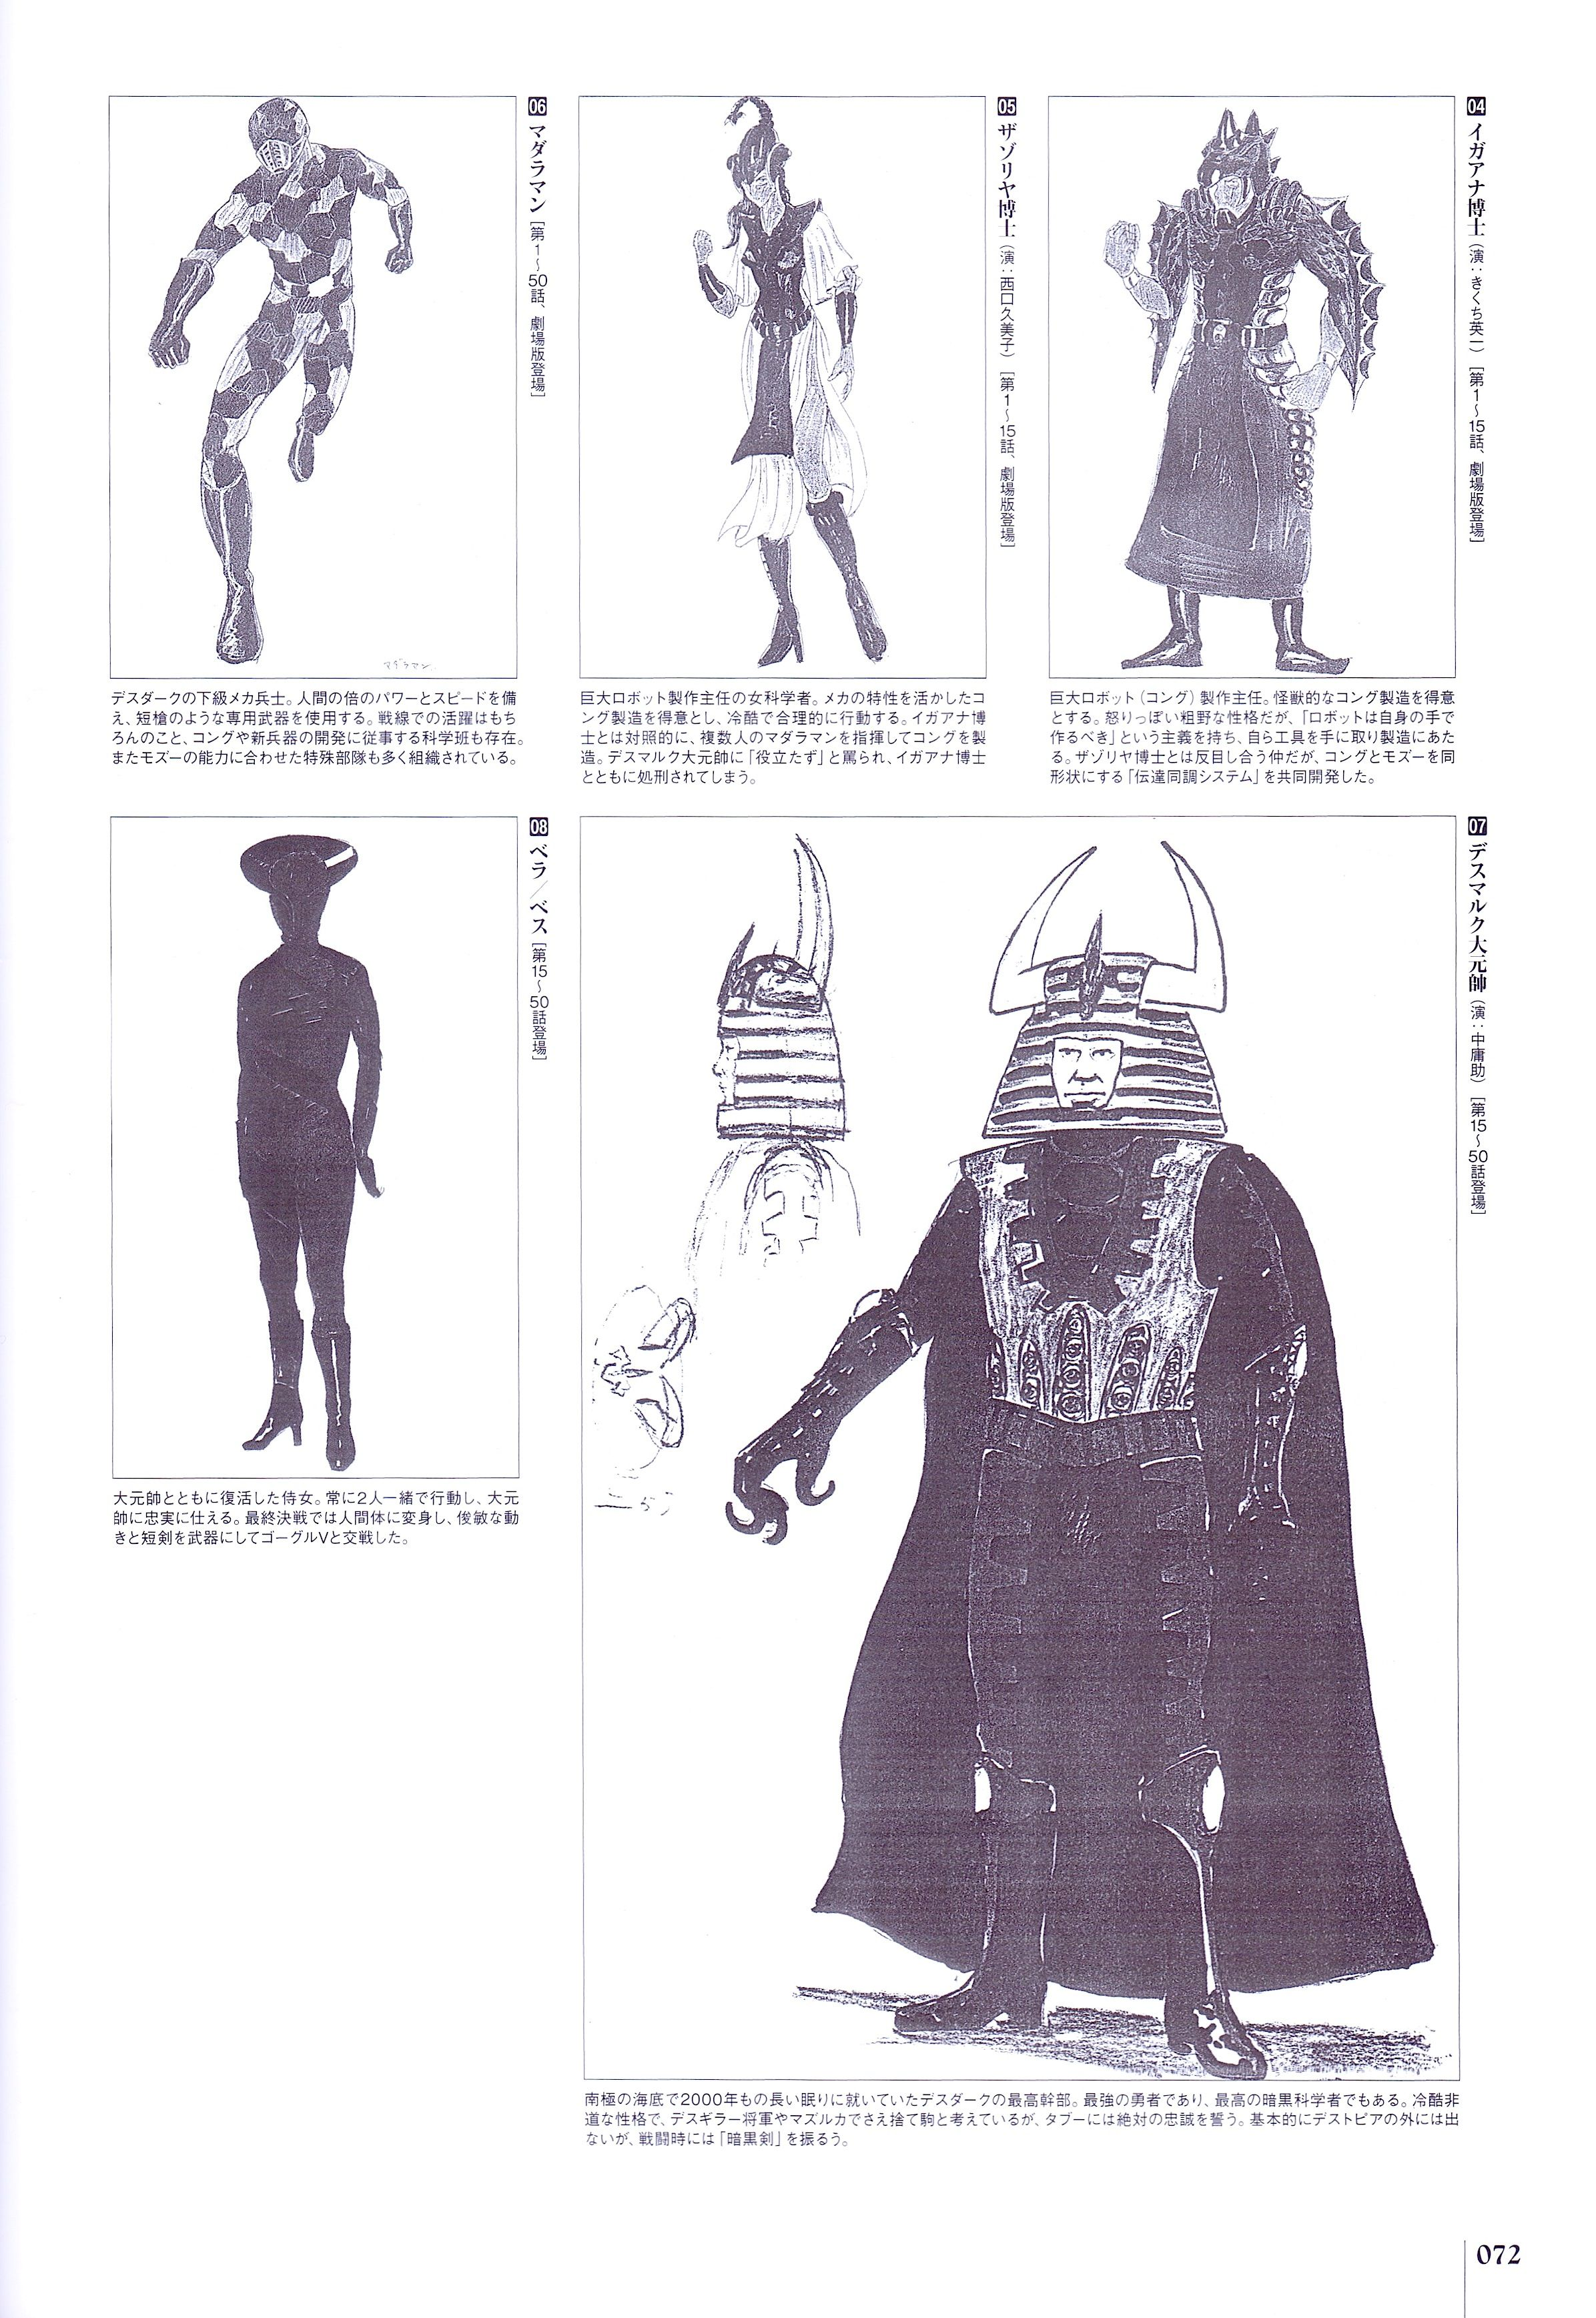 kaiju history 1982 goggle five プロダクトスケッチ ロゴデザイン ロゴ